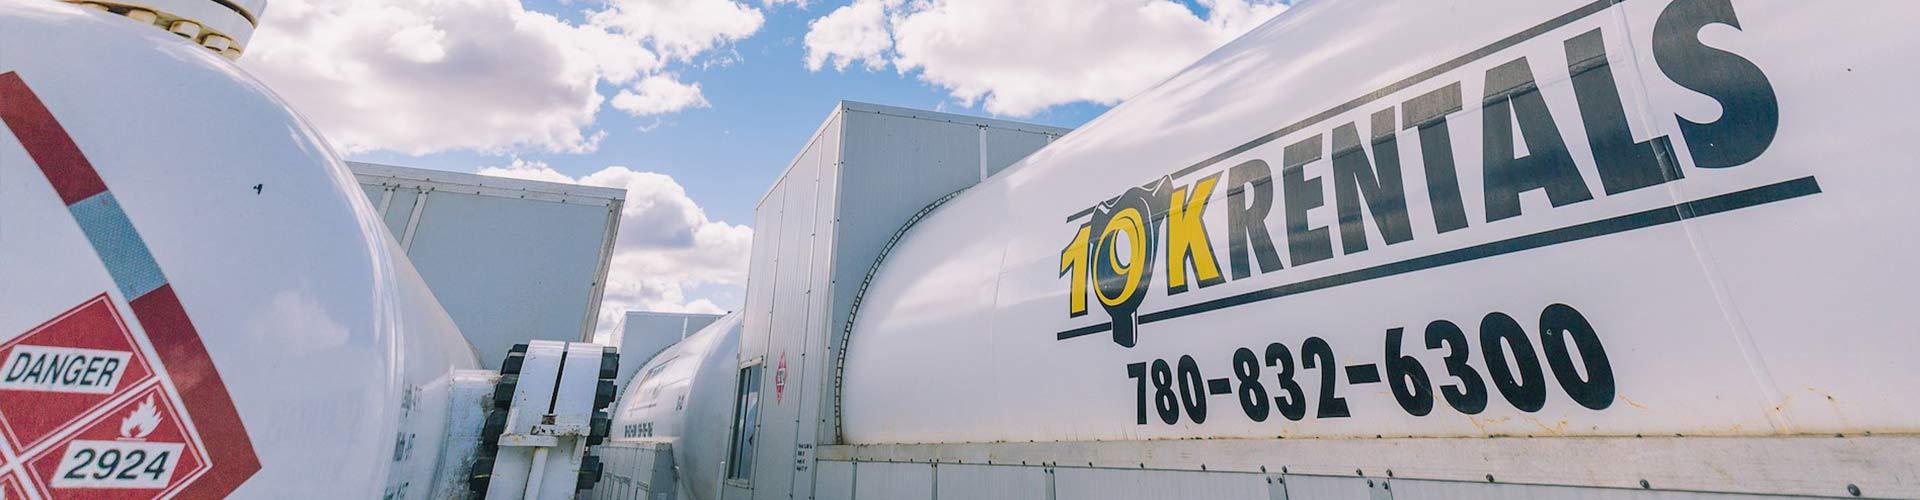 Oilfield storage tanks, oilfield storage tank, prevent well freezing, frac flowback